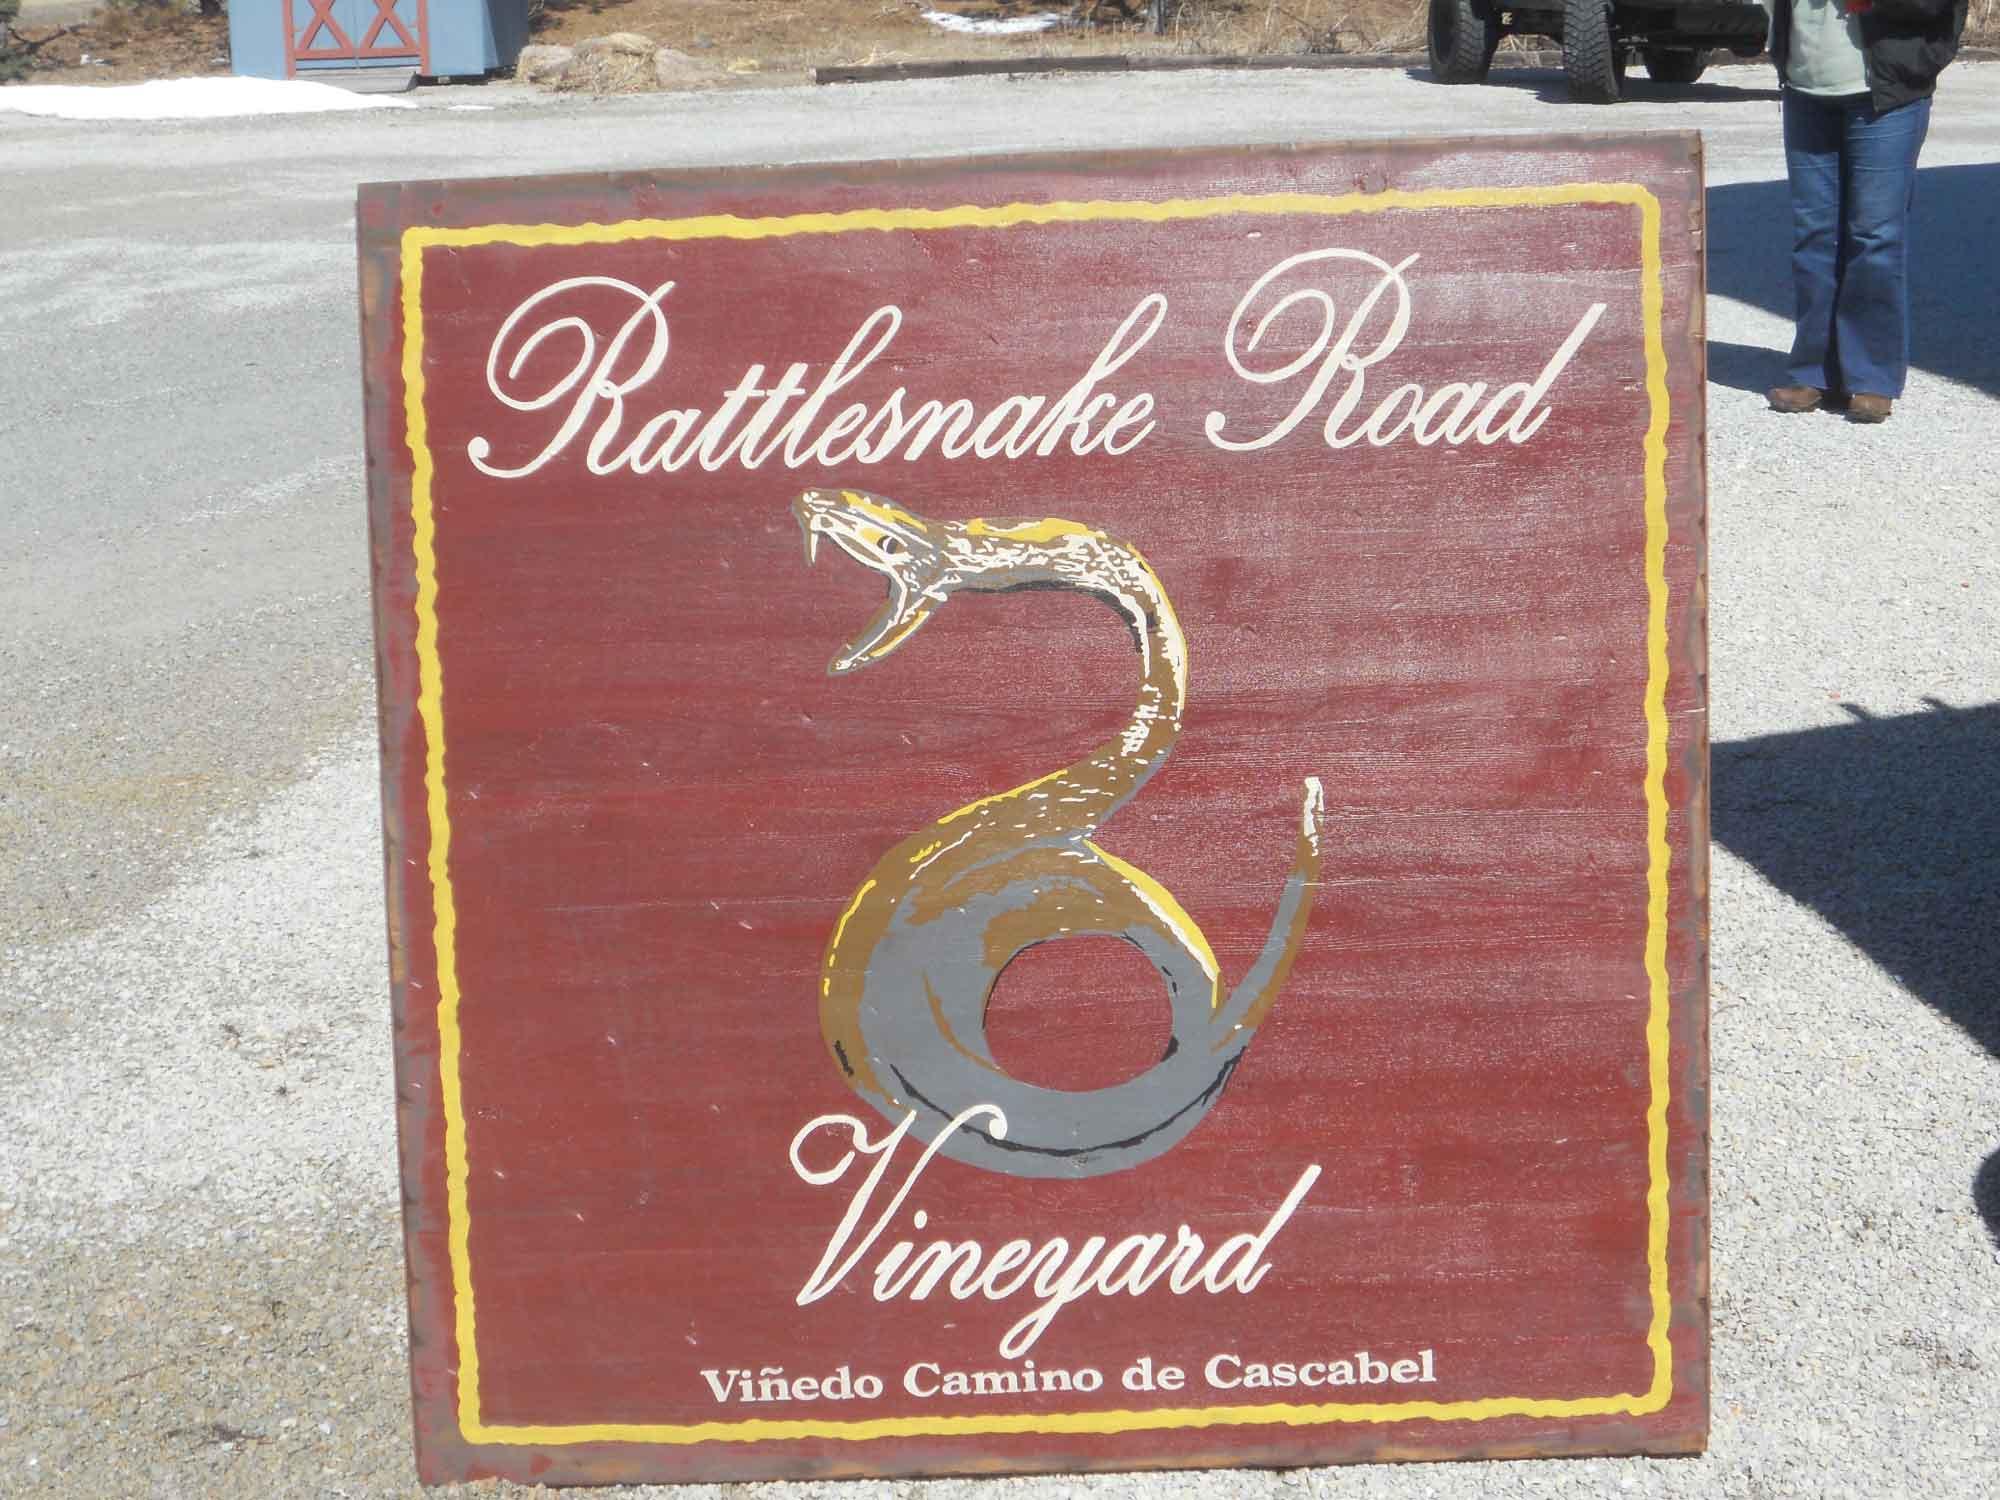 Rattlesnake Road Vineyard